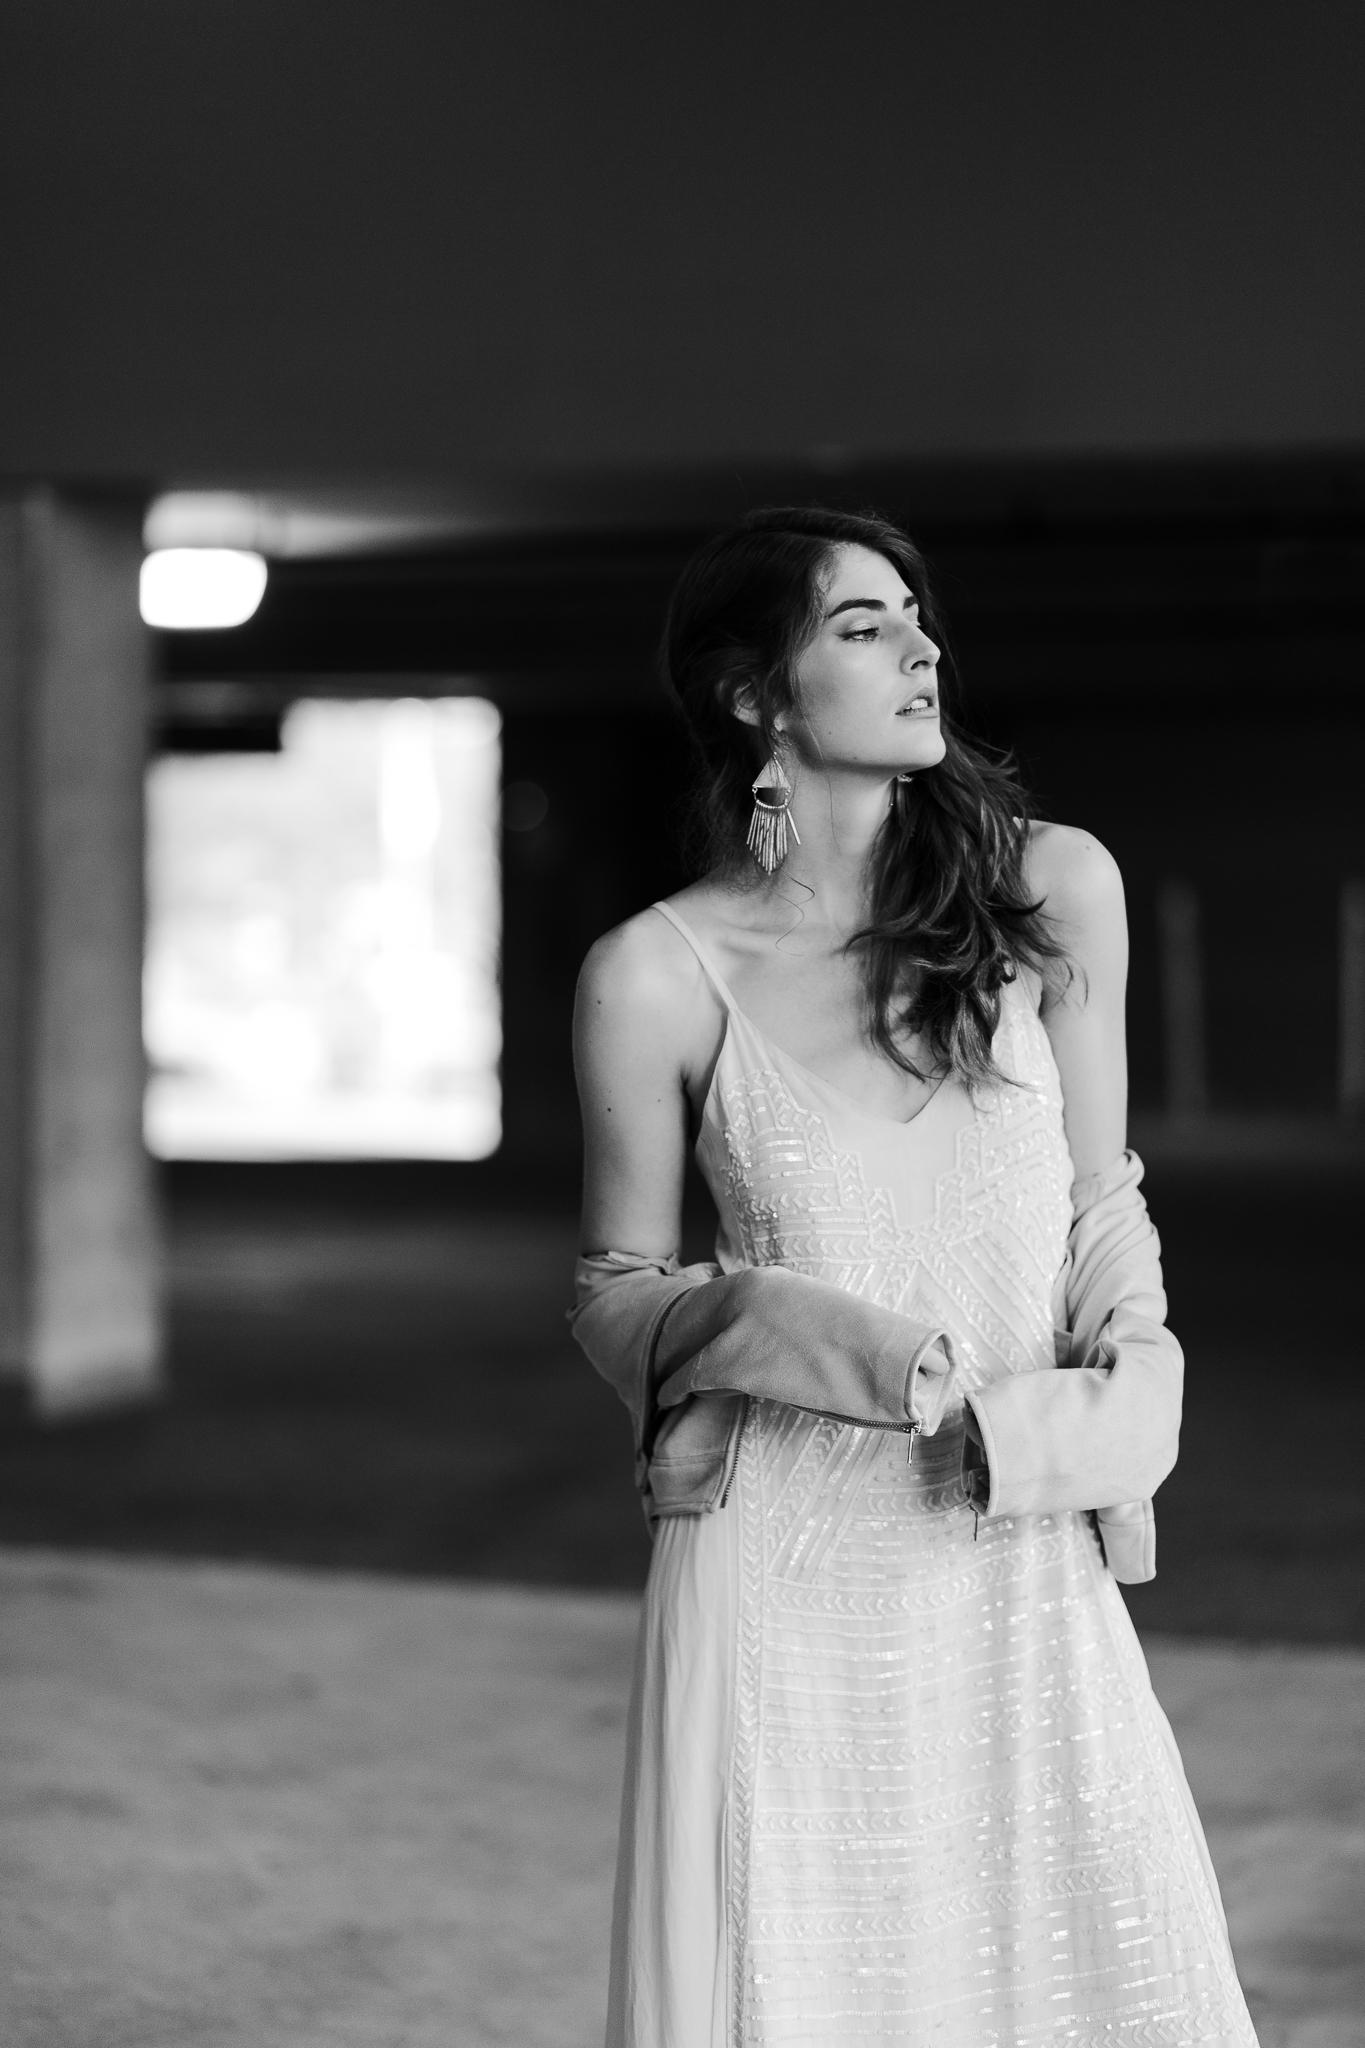 Amy - Bridal Styled Shoot - Vancouver WA - Malina Rose Photography small --17.jpg